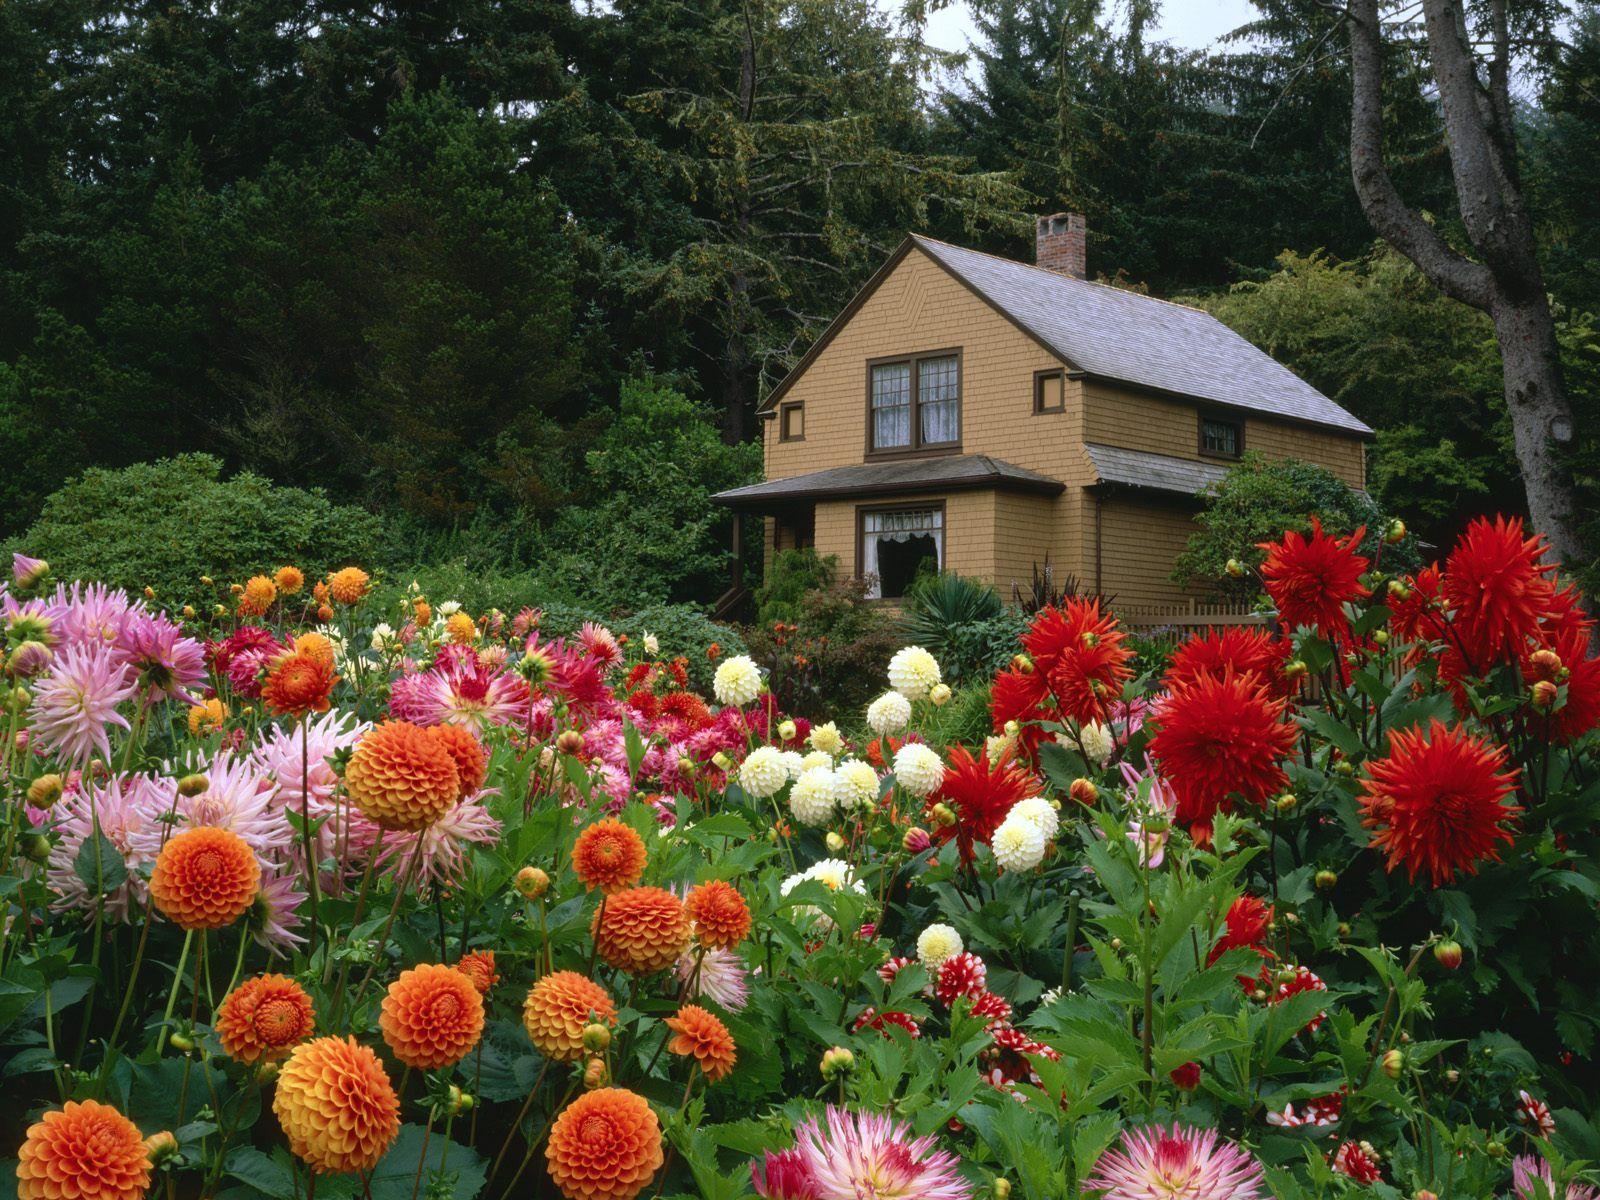 Garden House And Dahlias Shore Acres State Park Oregon1600x1200